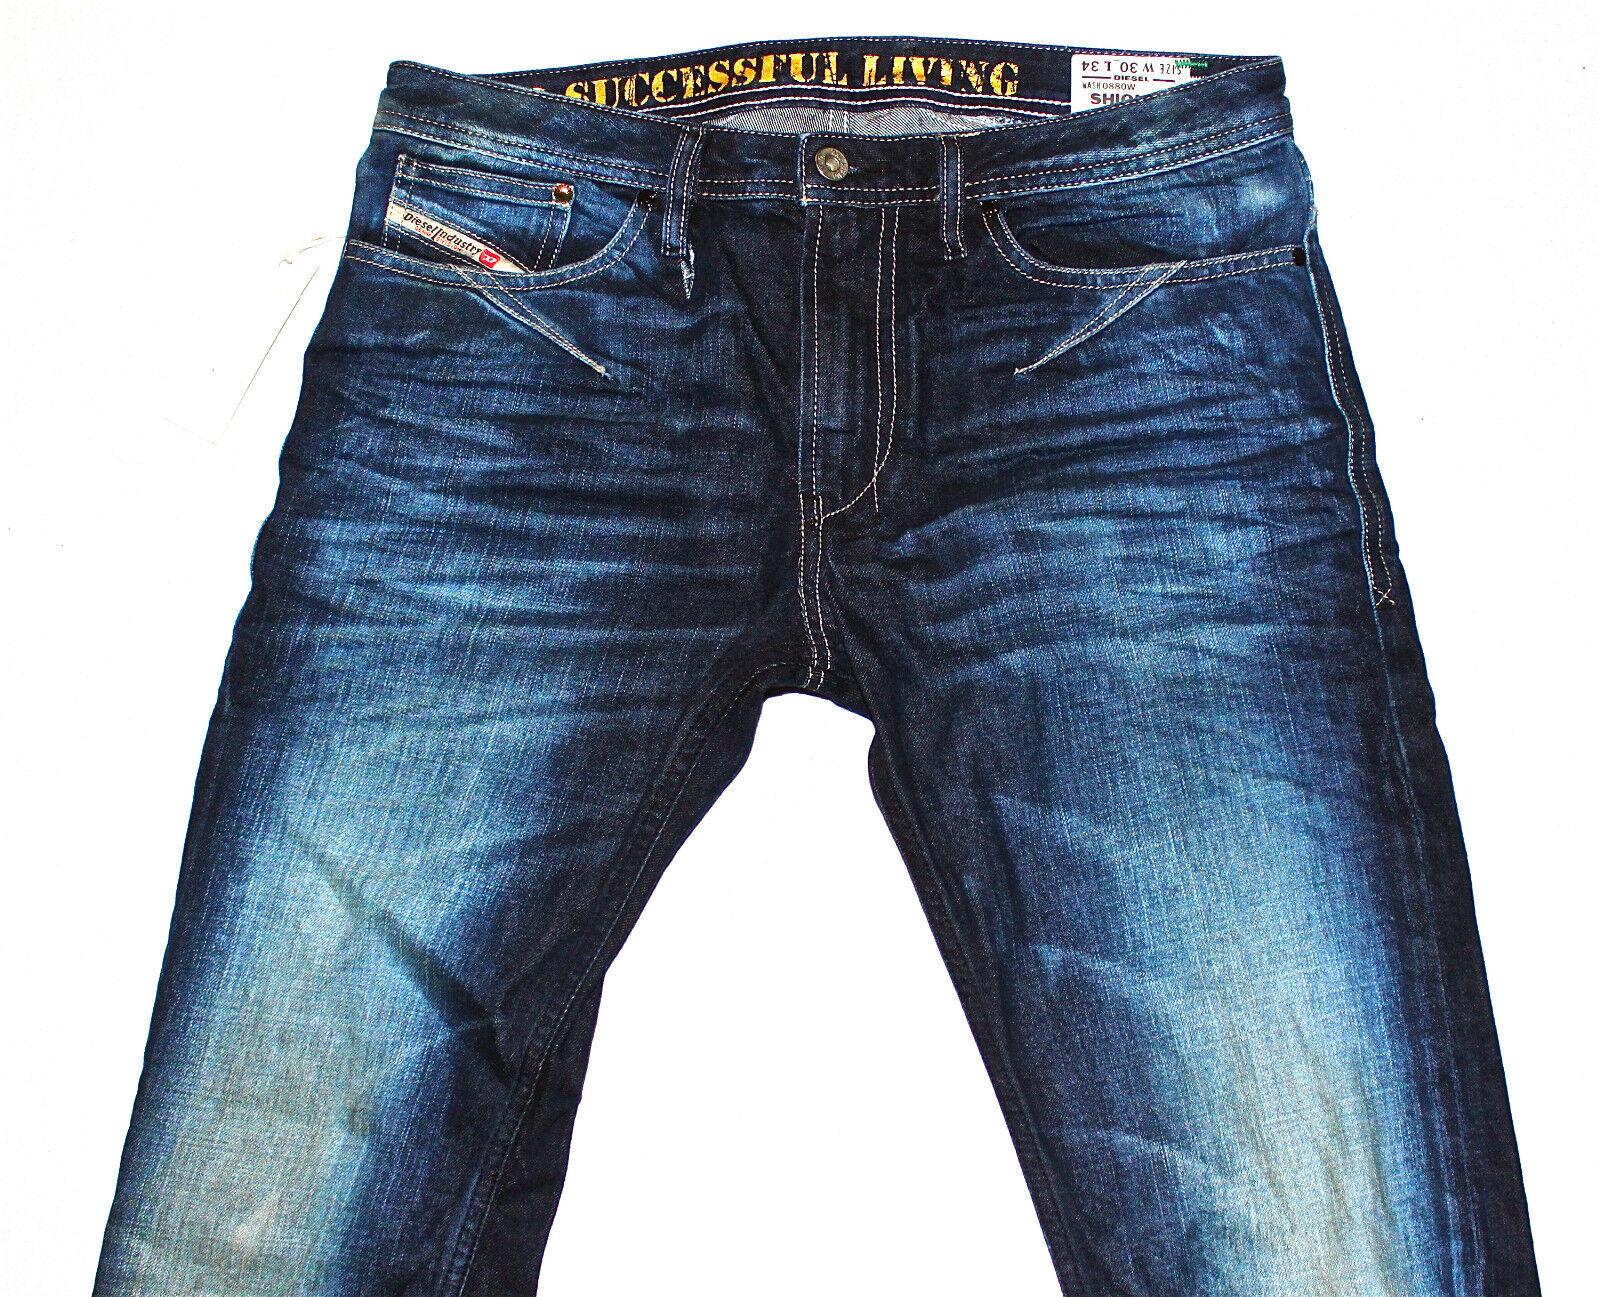 BNWT DIESEL SHIONER 880W JEANS 30X34 100% AUTHENTIC SKINNY FIT FIT FIT TAPErot LEG 192dfb